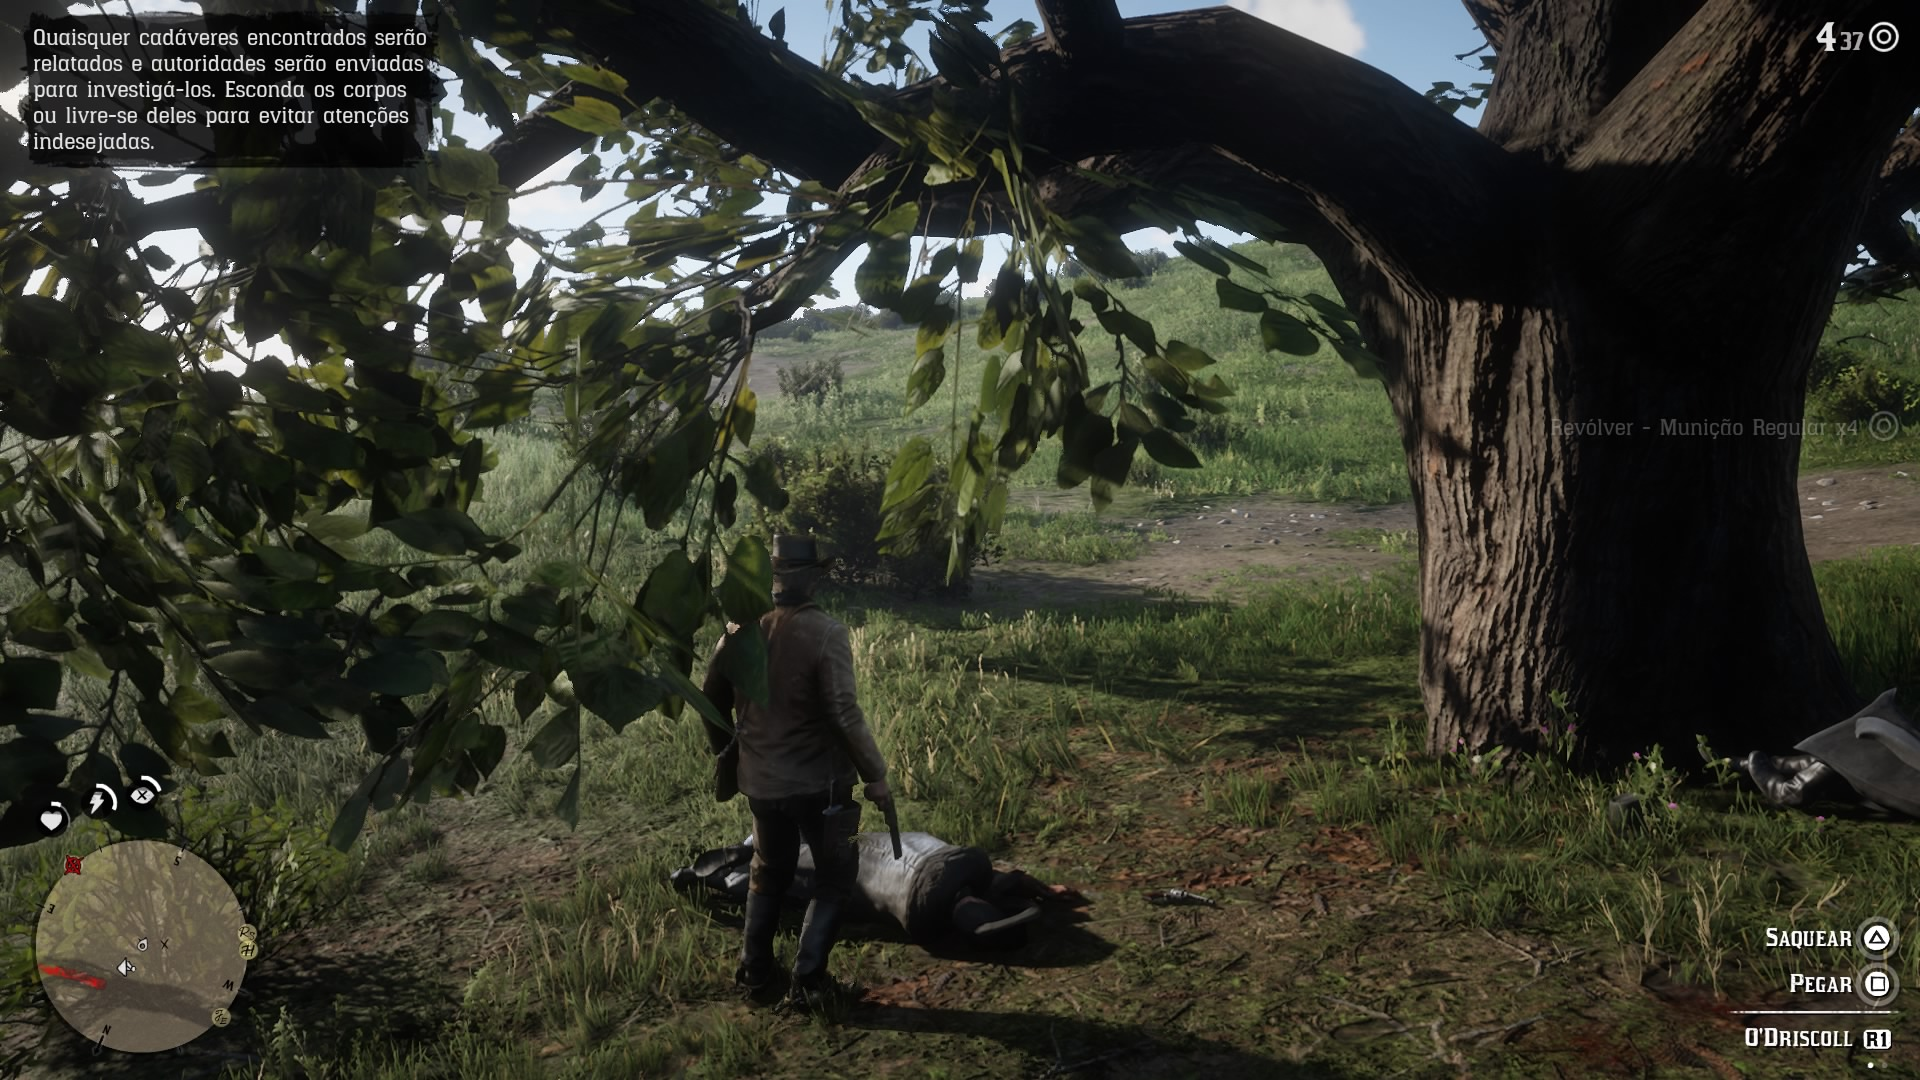 Red Dead Redemption 2 e o sabor de uma síntese dos videogames 2